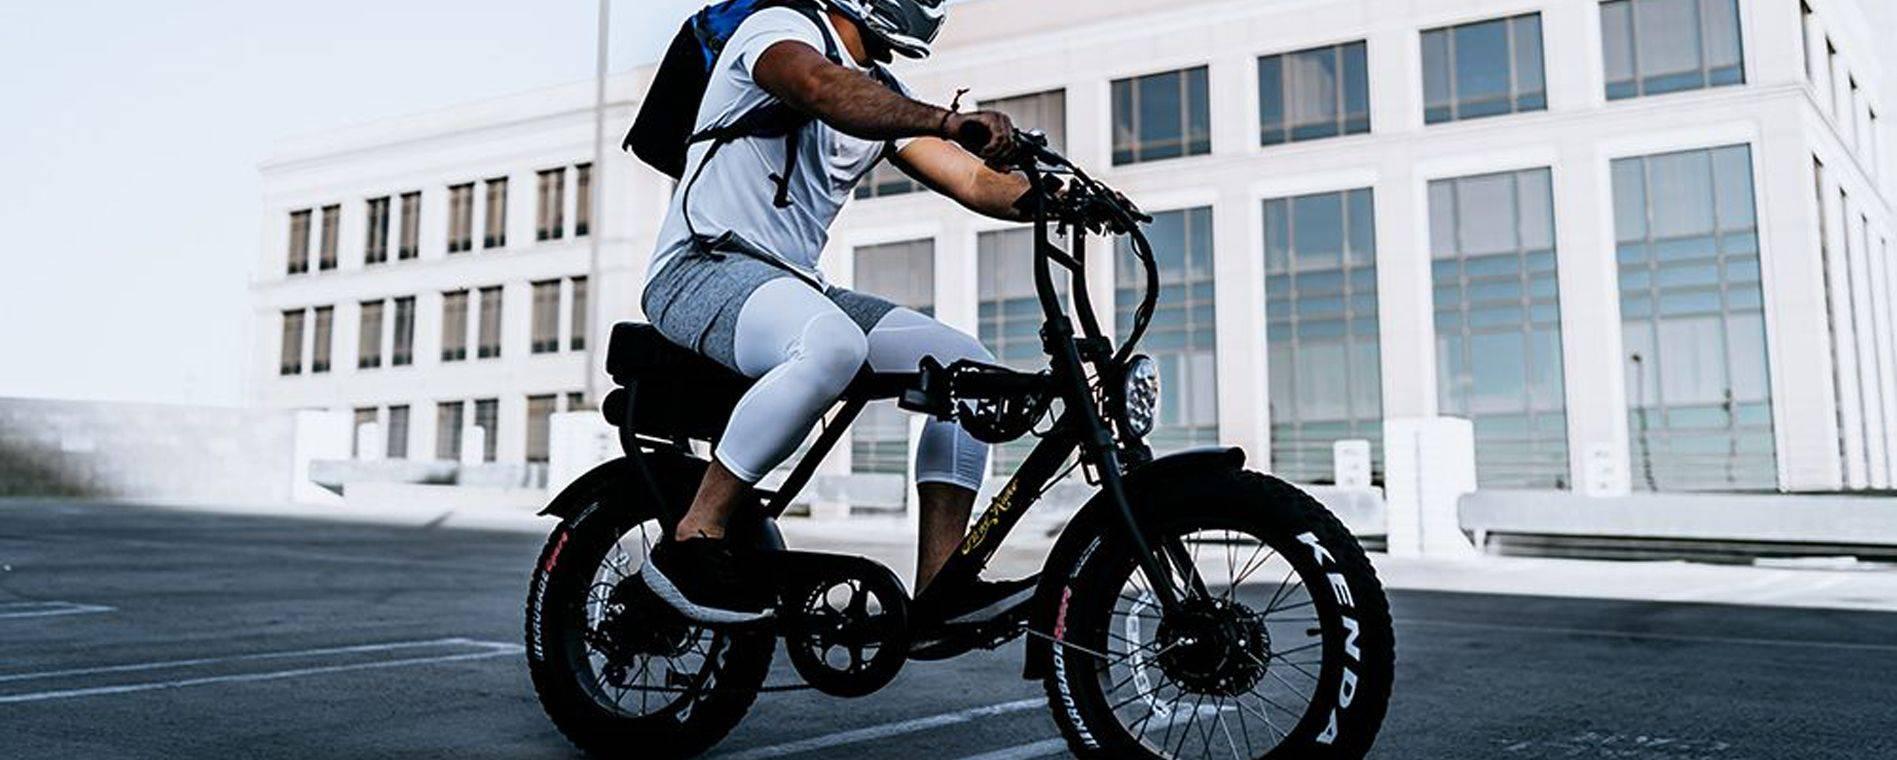 Ariel Rider D-Class Dual Motor Electric Scrambler Bike